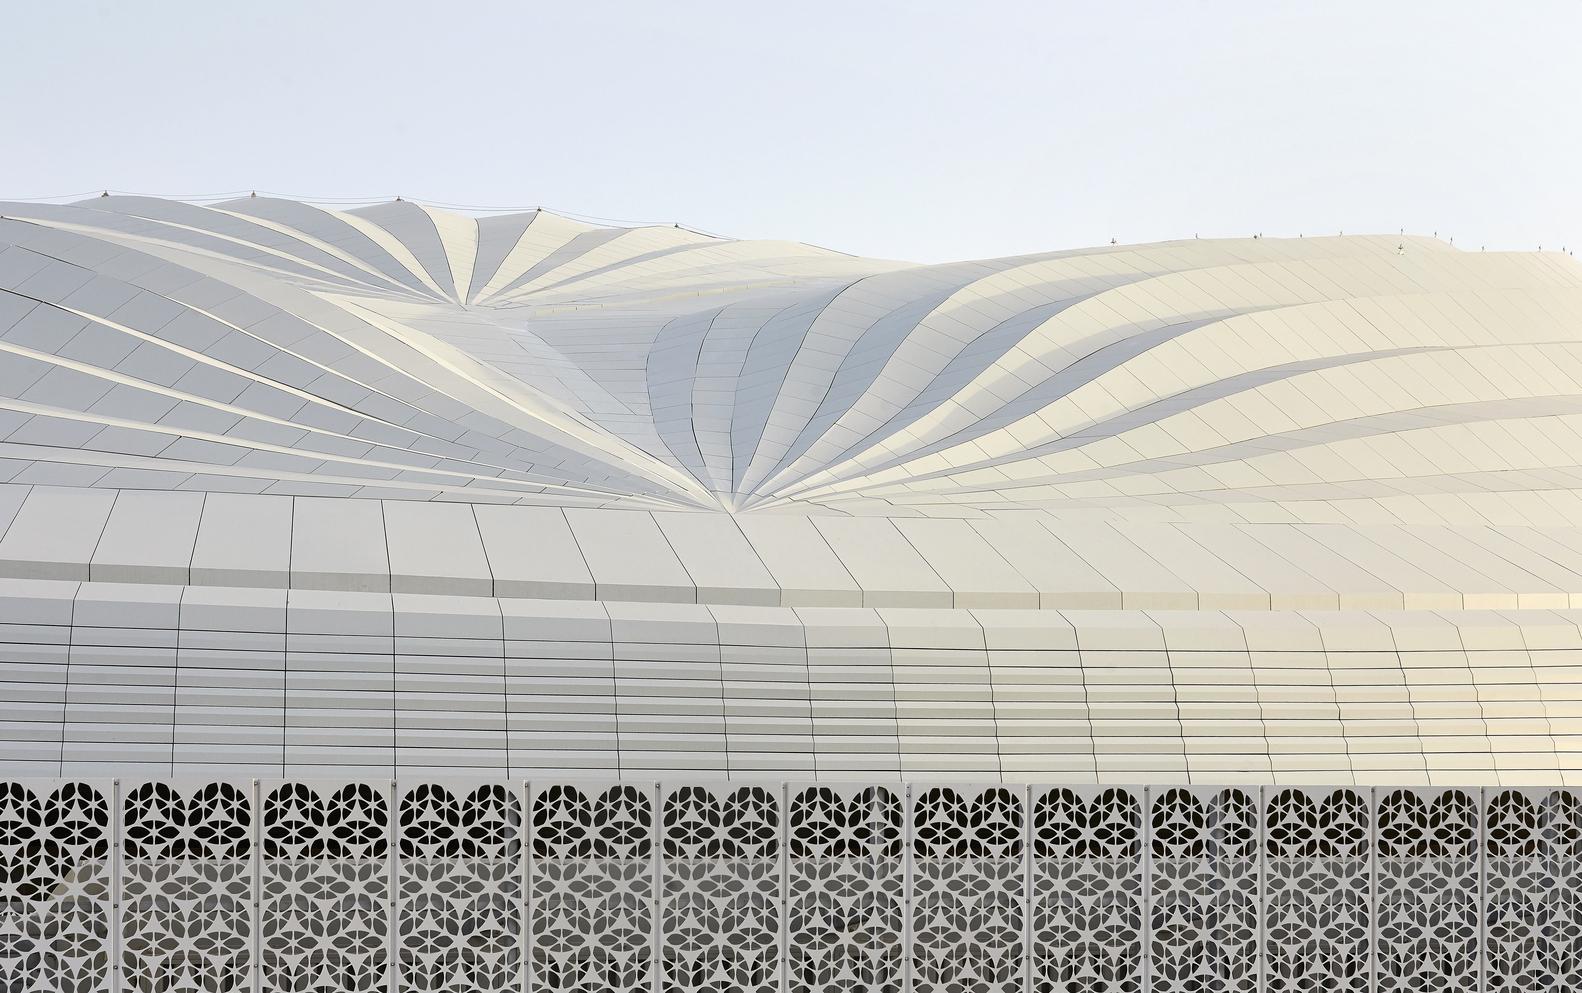 Al Janoub Stadium / Zaha Hadid Architects